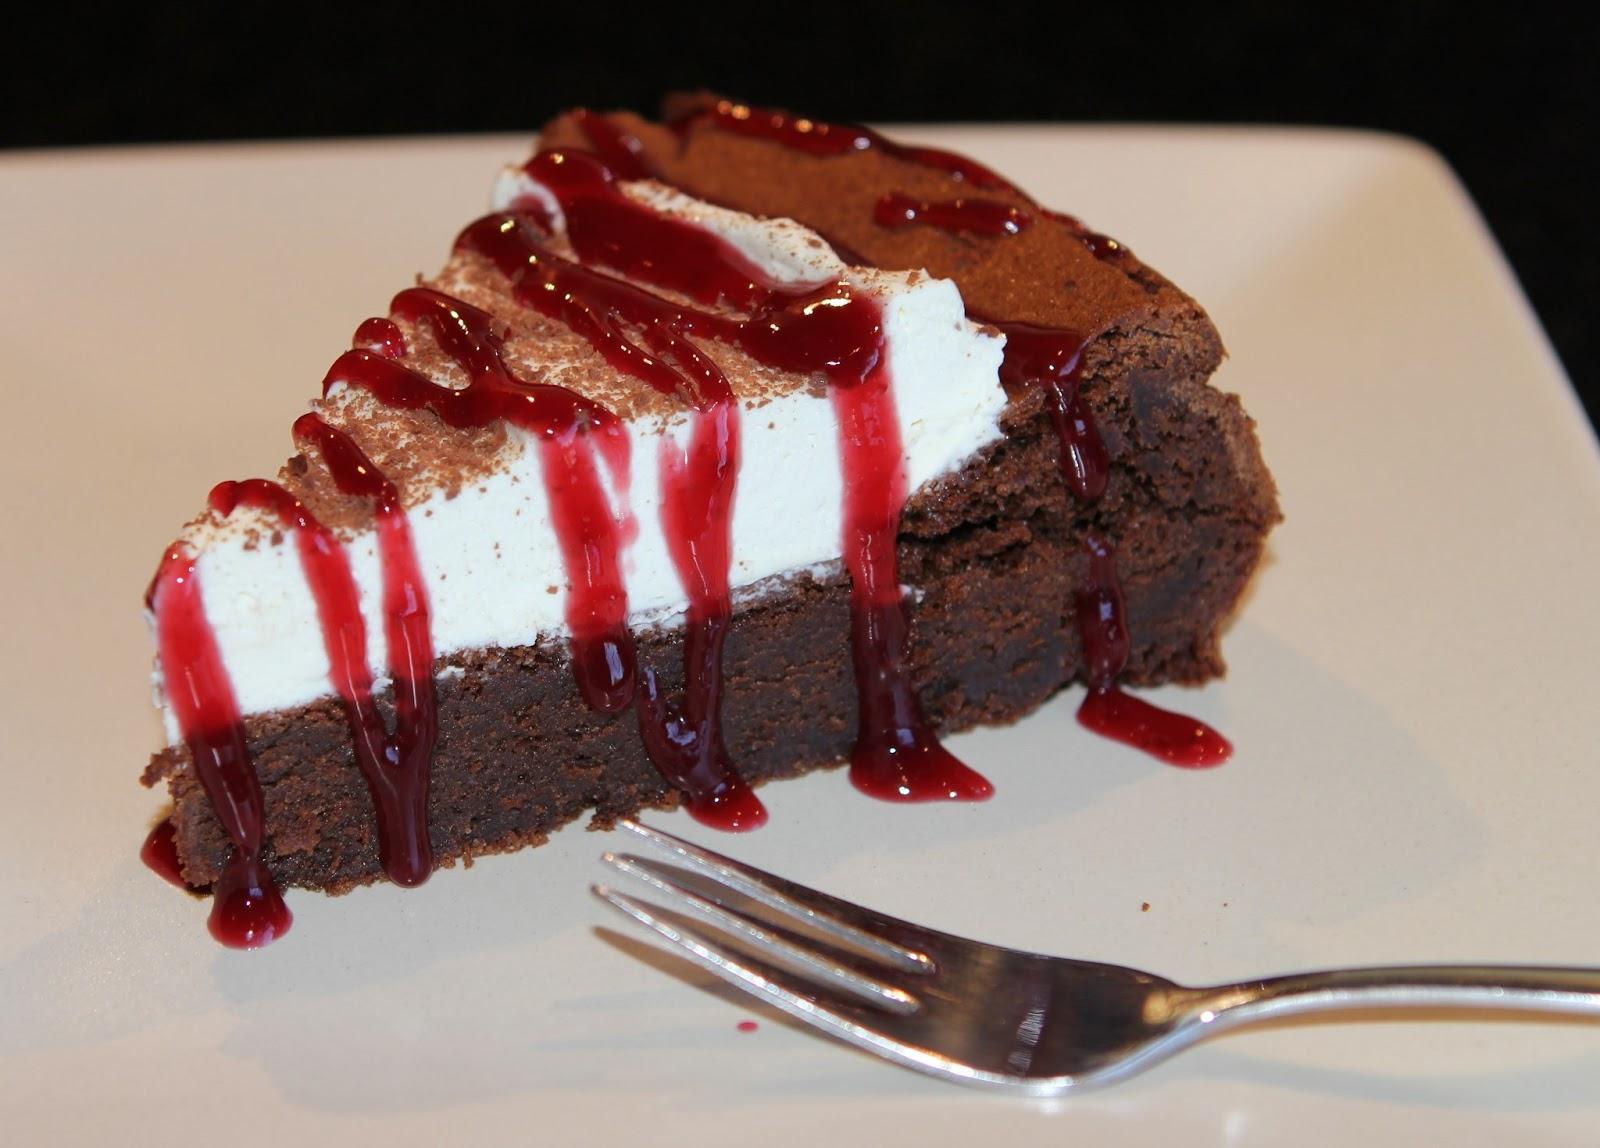 Alchemist Chocolate Cake